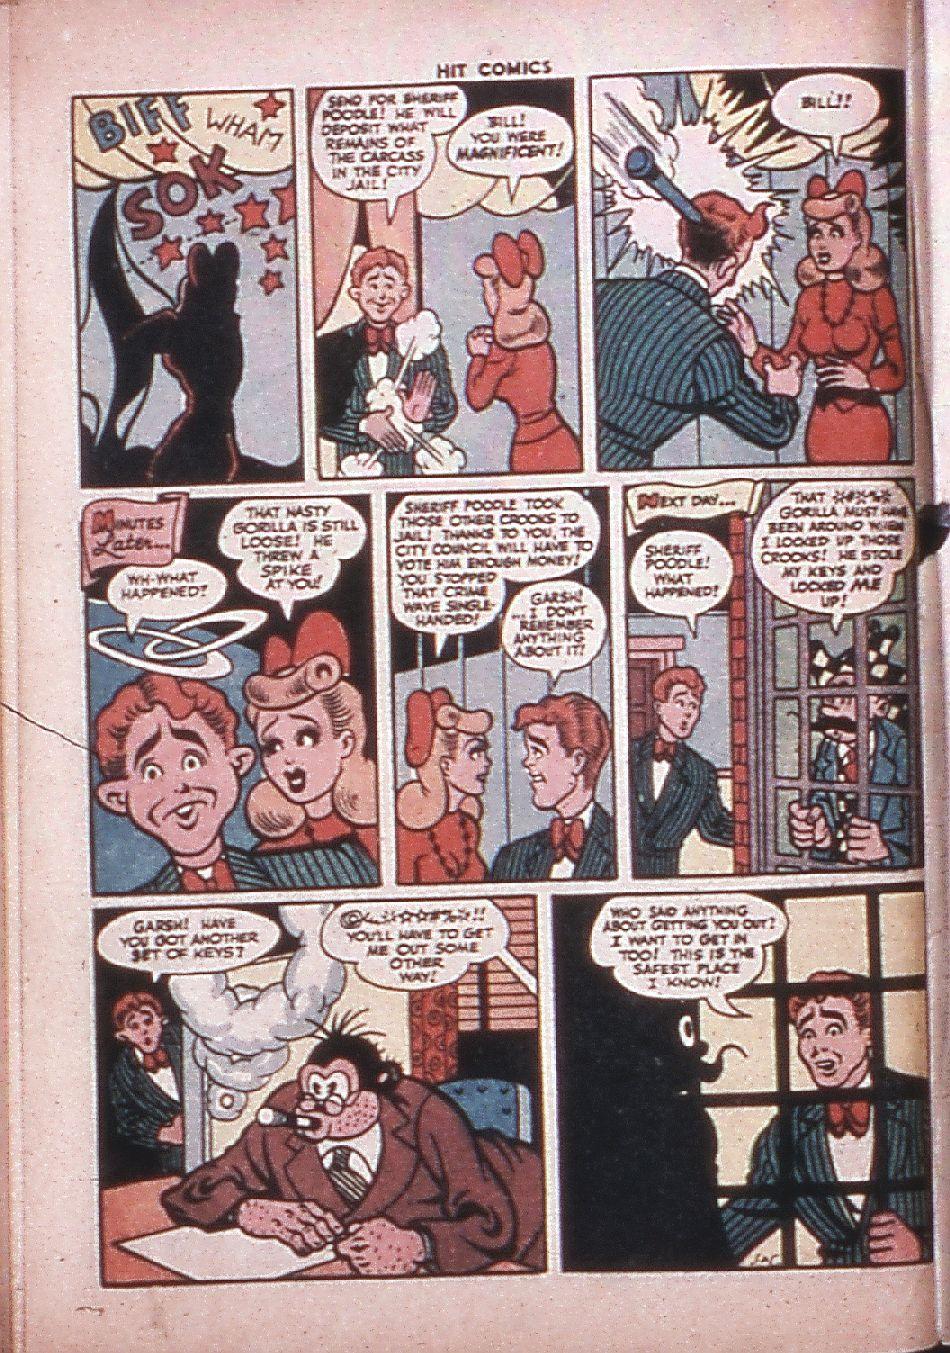 Read online Hit Comics comic -  Issue #33 - 57